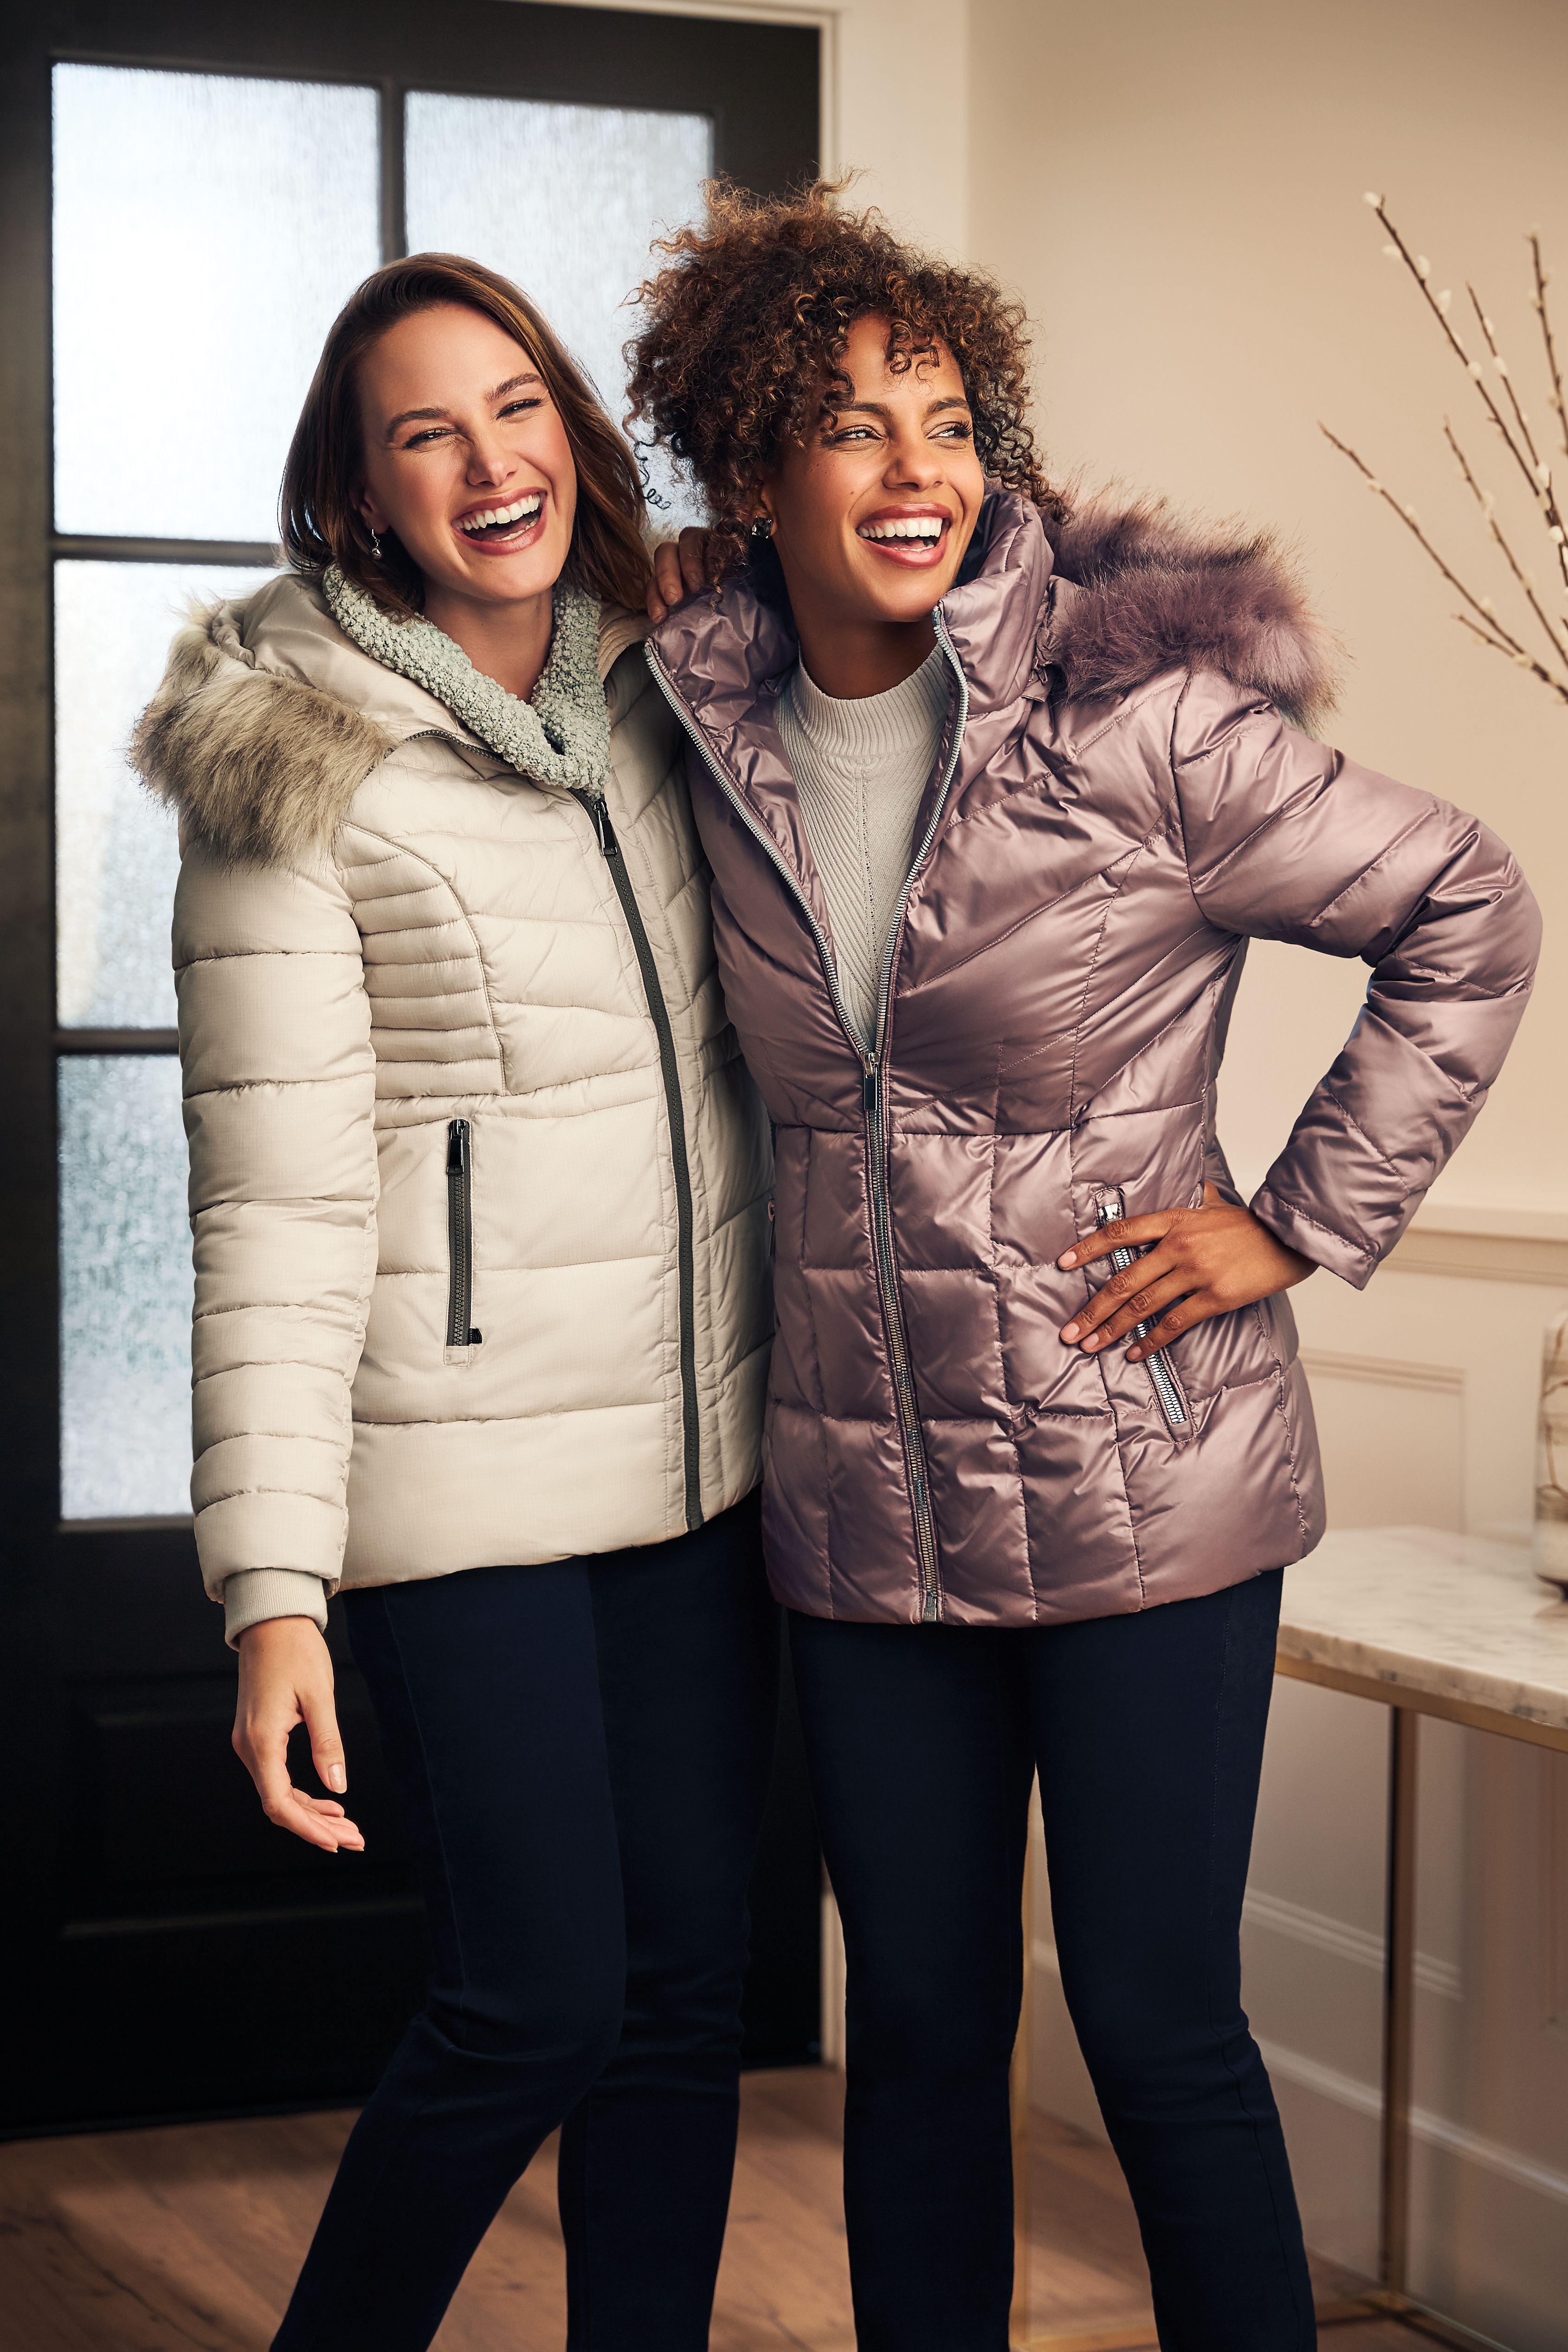 Laura Petites Outerwear Outerwear Women Stylish Outerwear Outerwear [ 5068 x 3379 Pixel ]